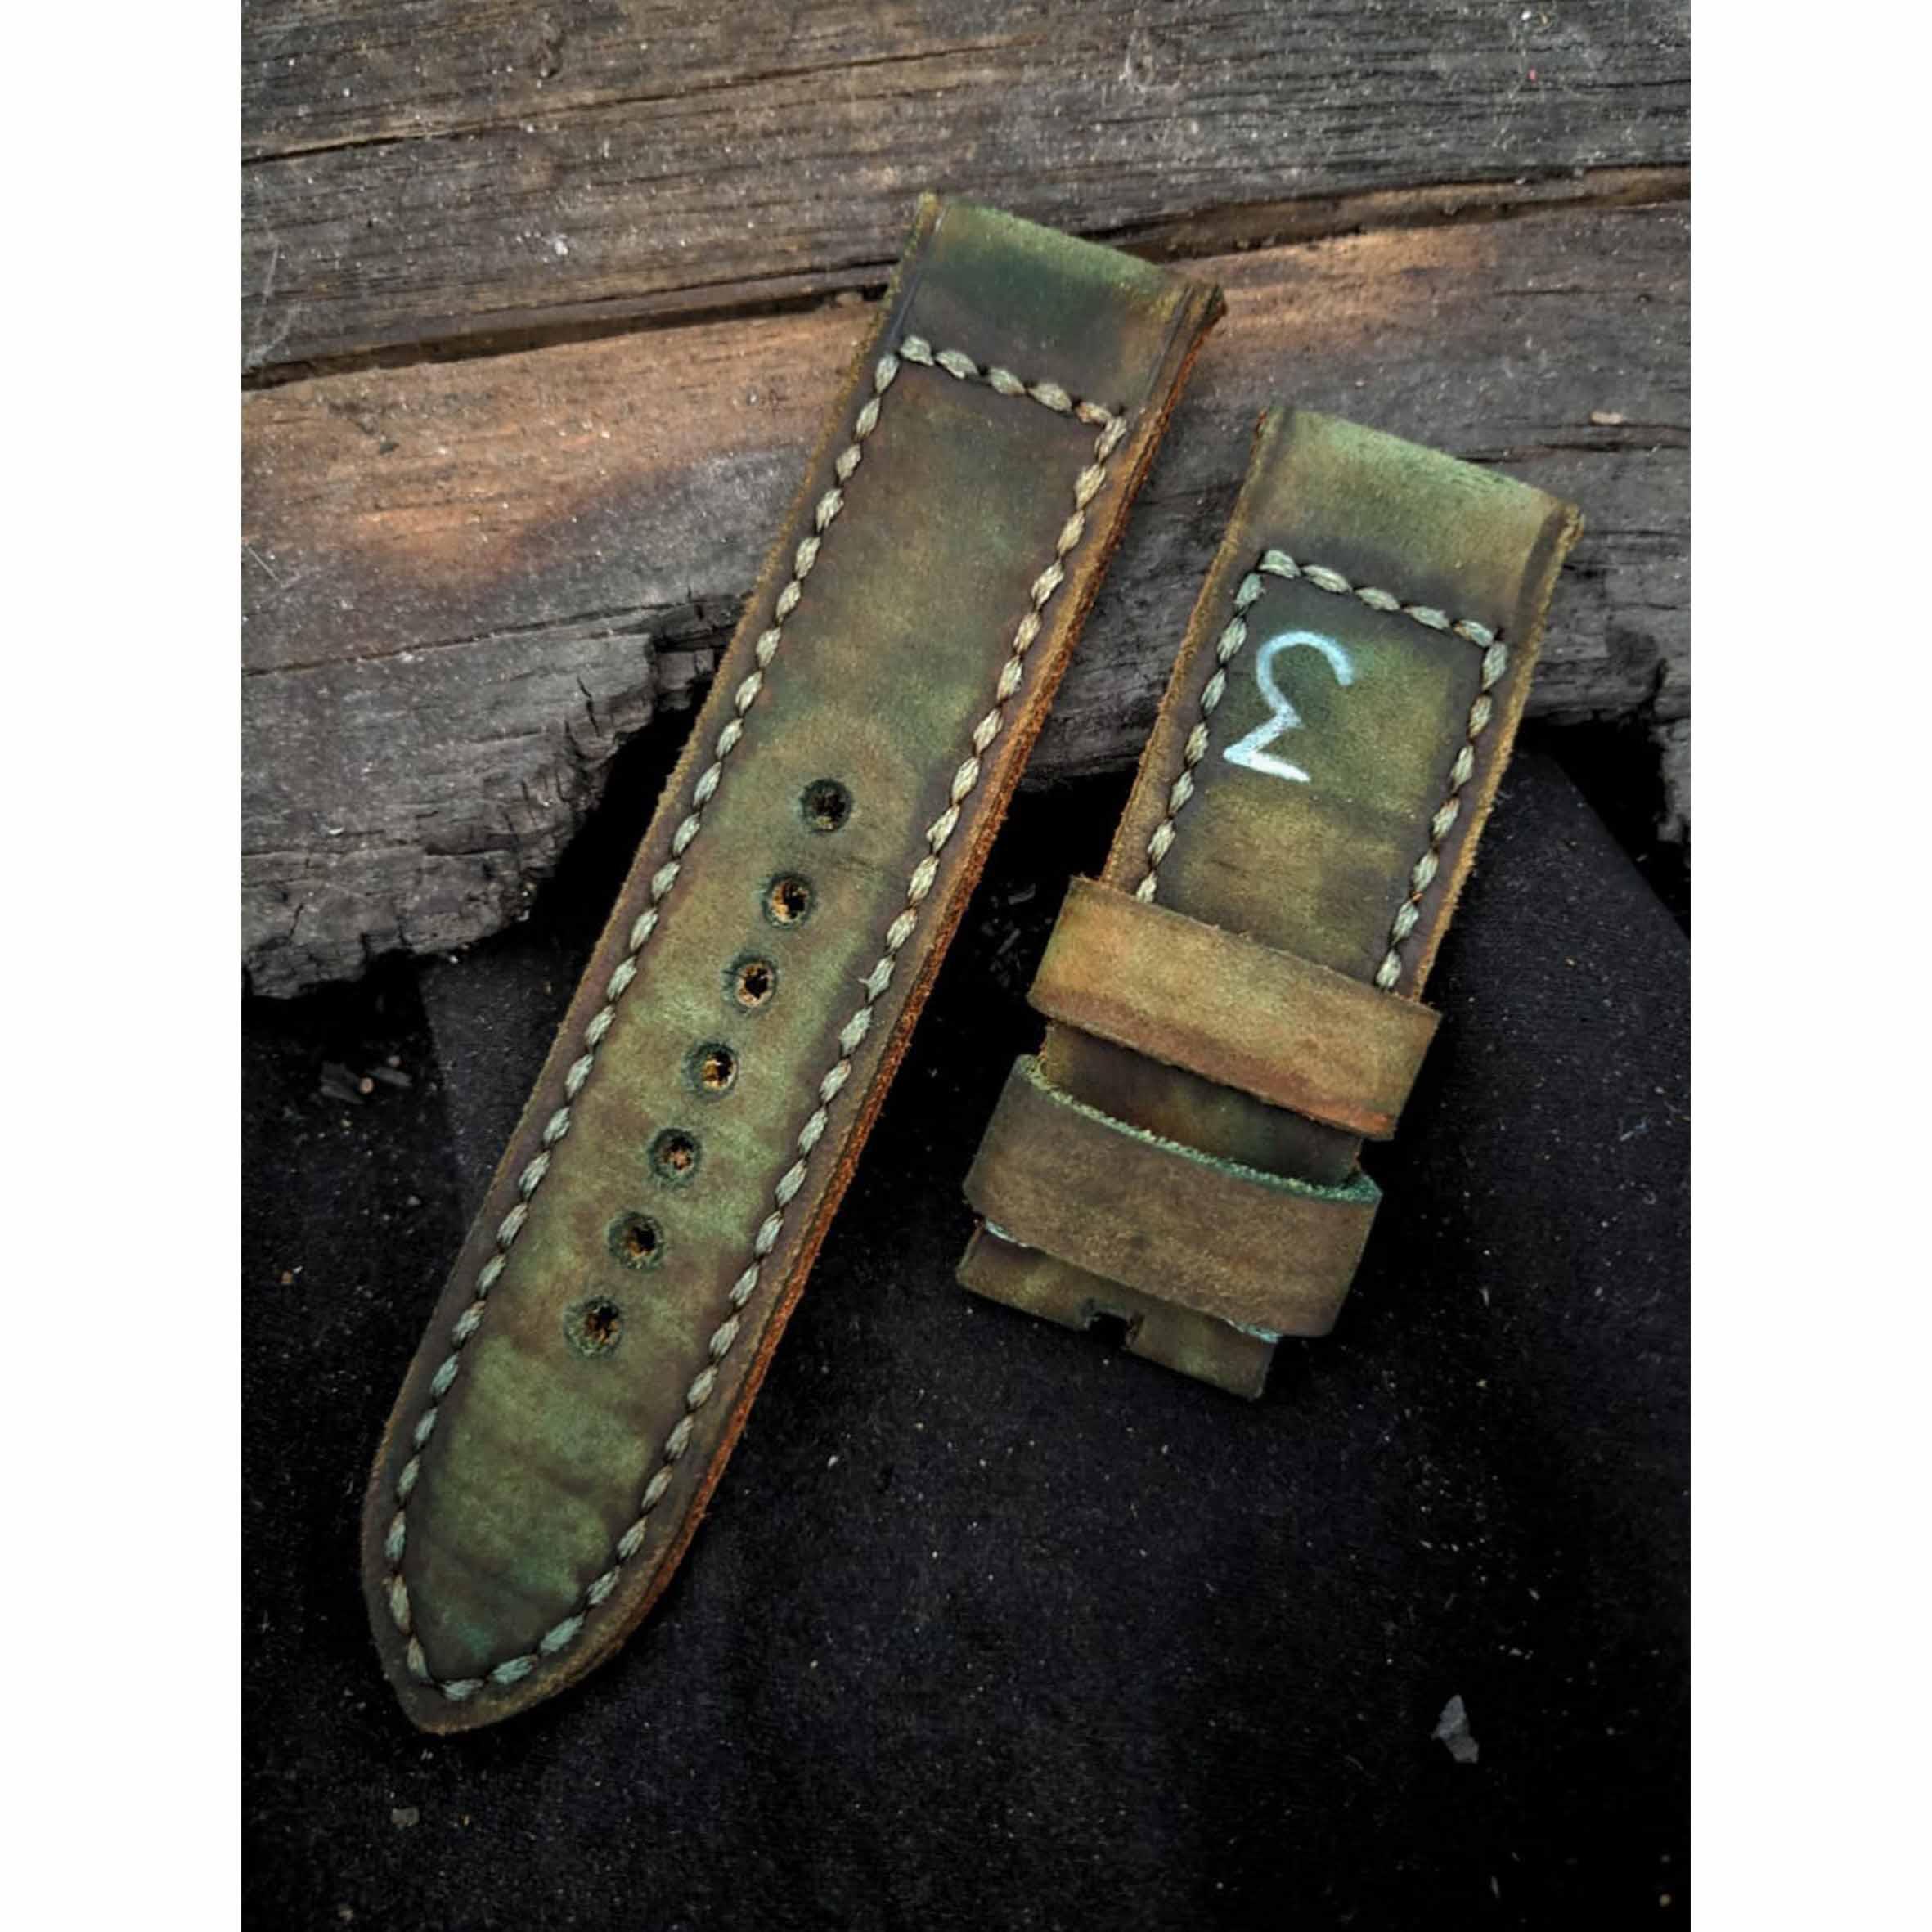 porteur-straps-cru-trois-strapsonly (1)